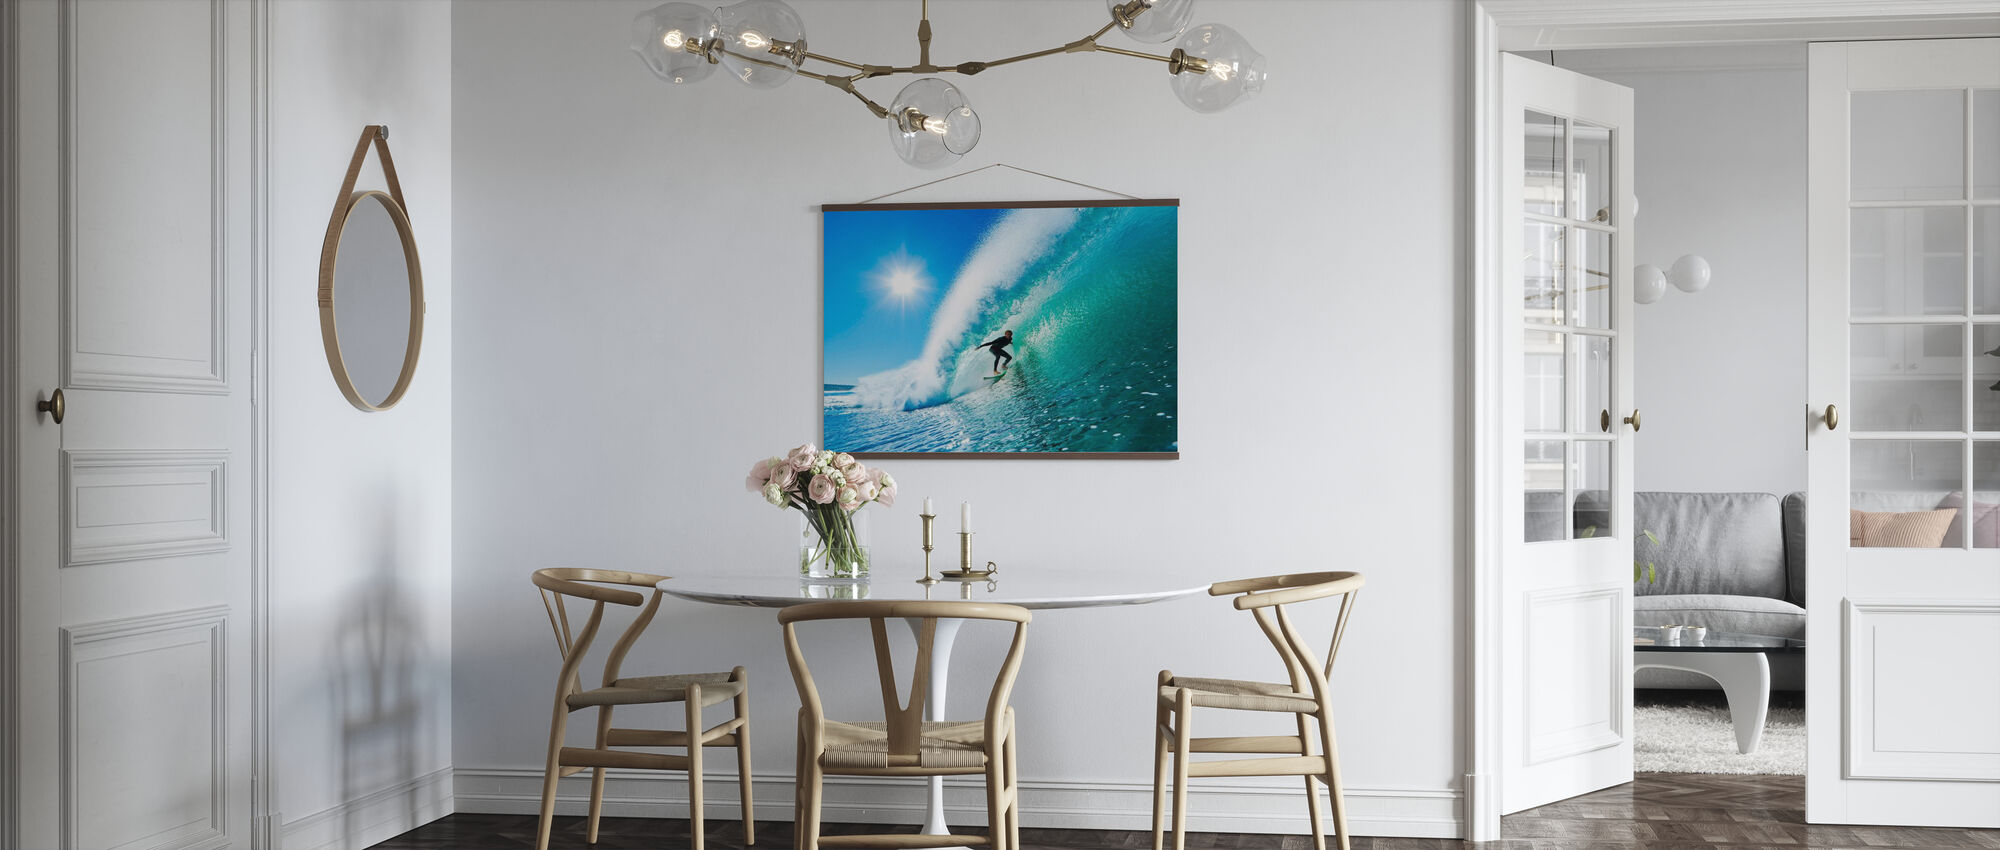 Surfing - Plakat - Køkken